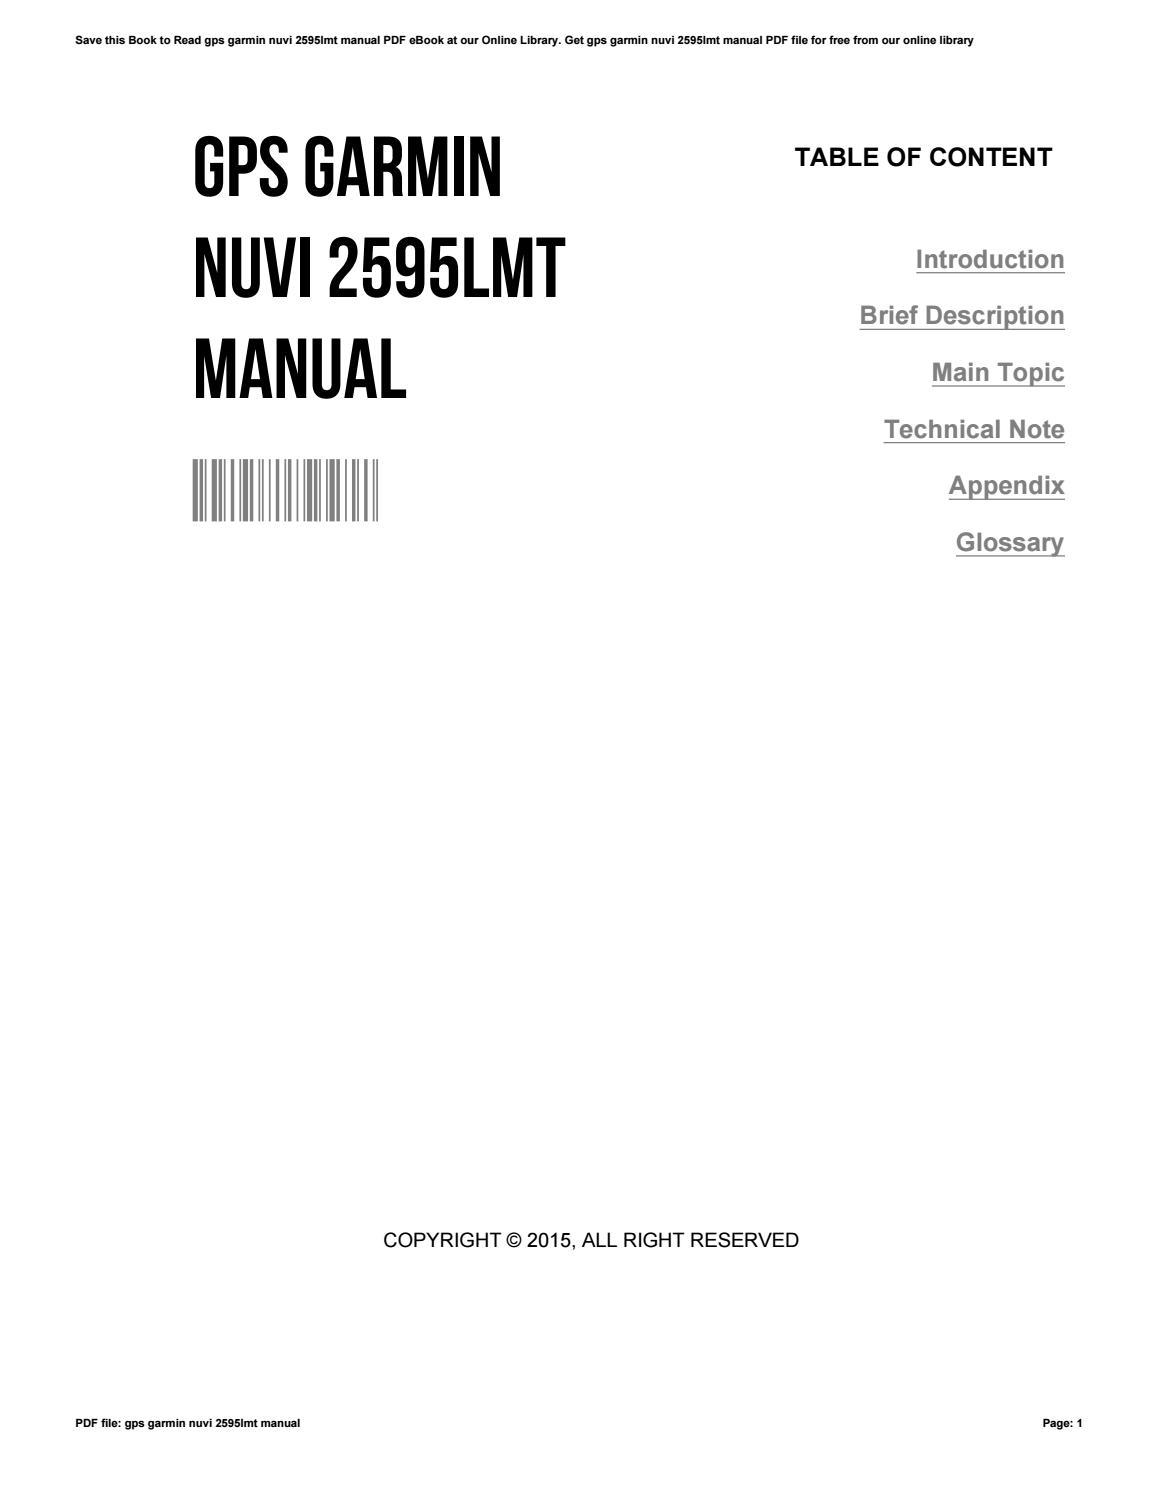 Image Result For Garmin Nuvi 2595lmt